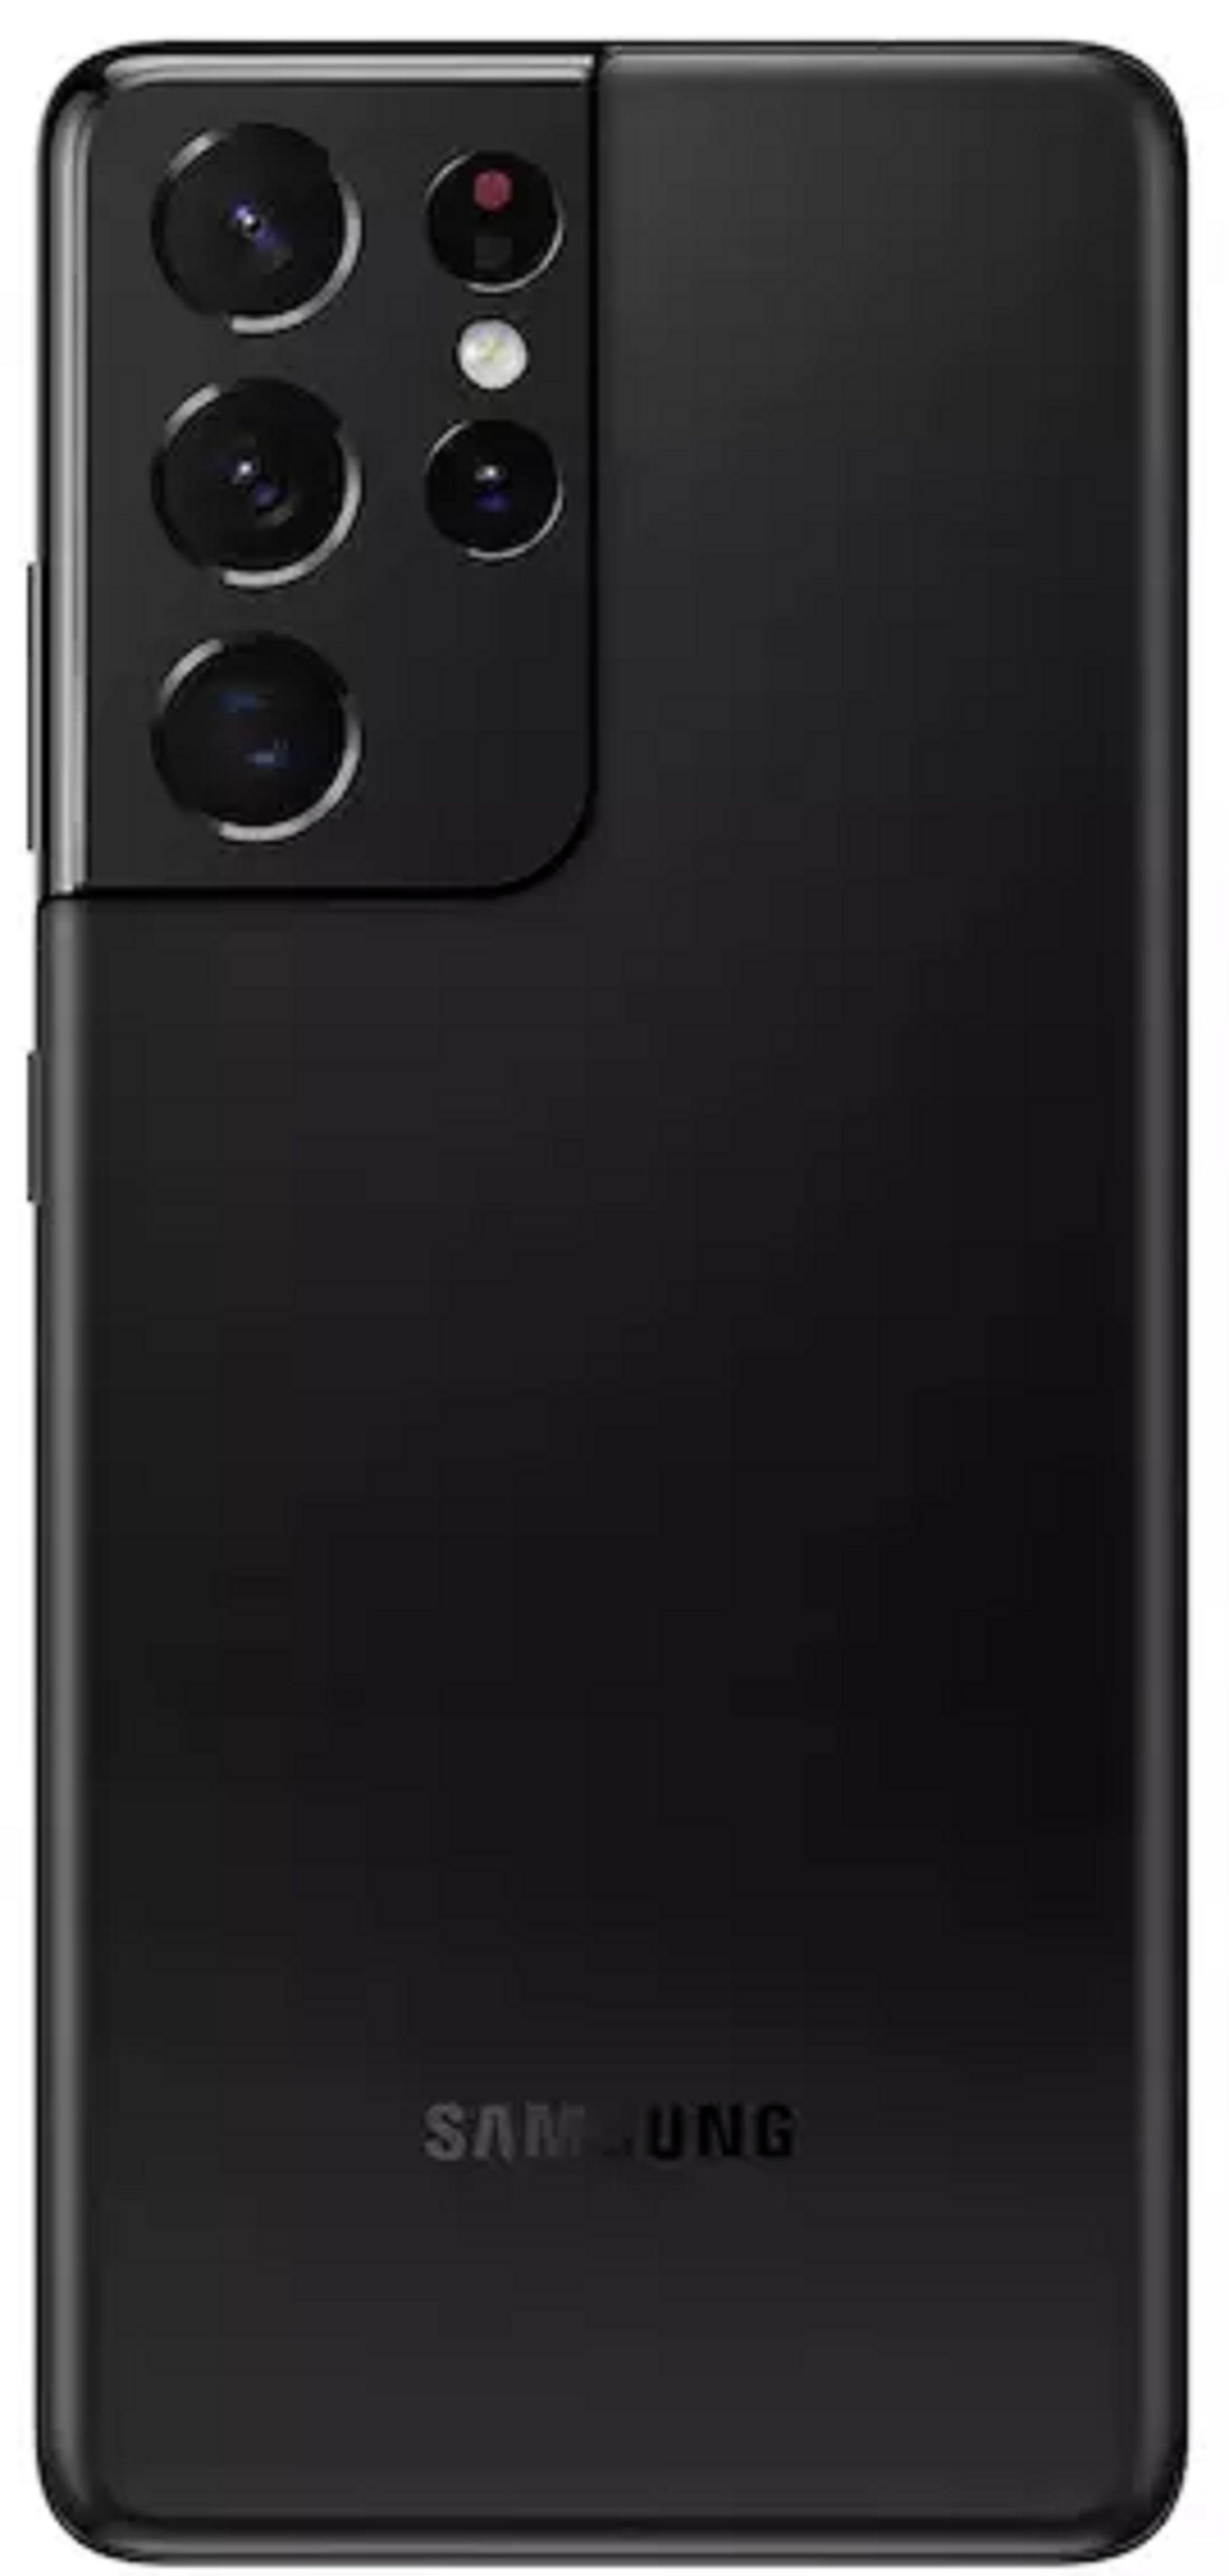 thumbnail 4 - Samsung Galaxy G998U S21 Ultra 5G 128GB Unlocked Smartphone - Excellent